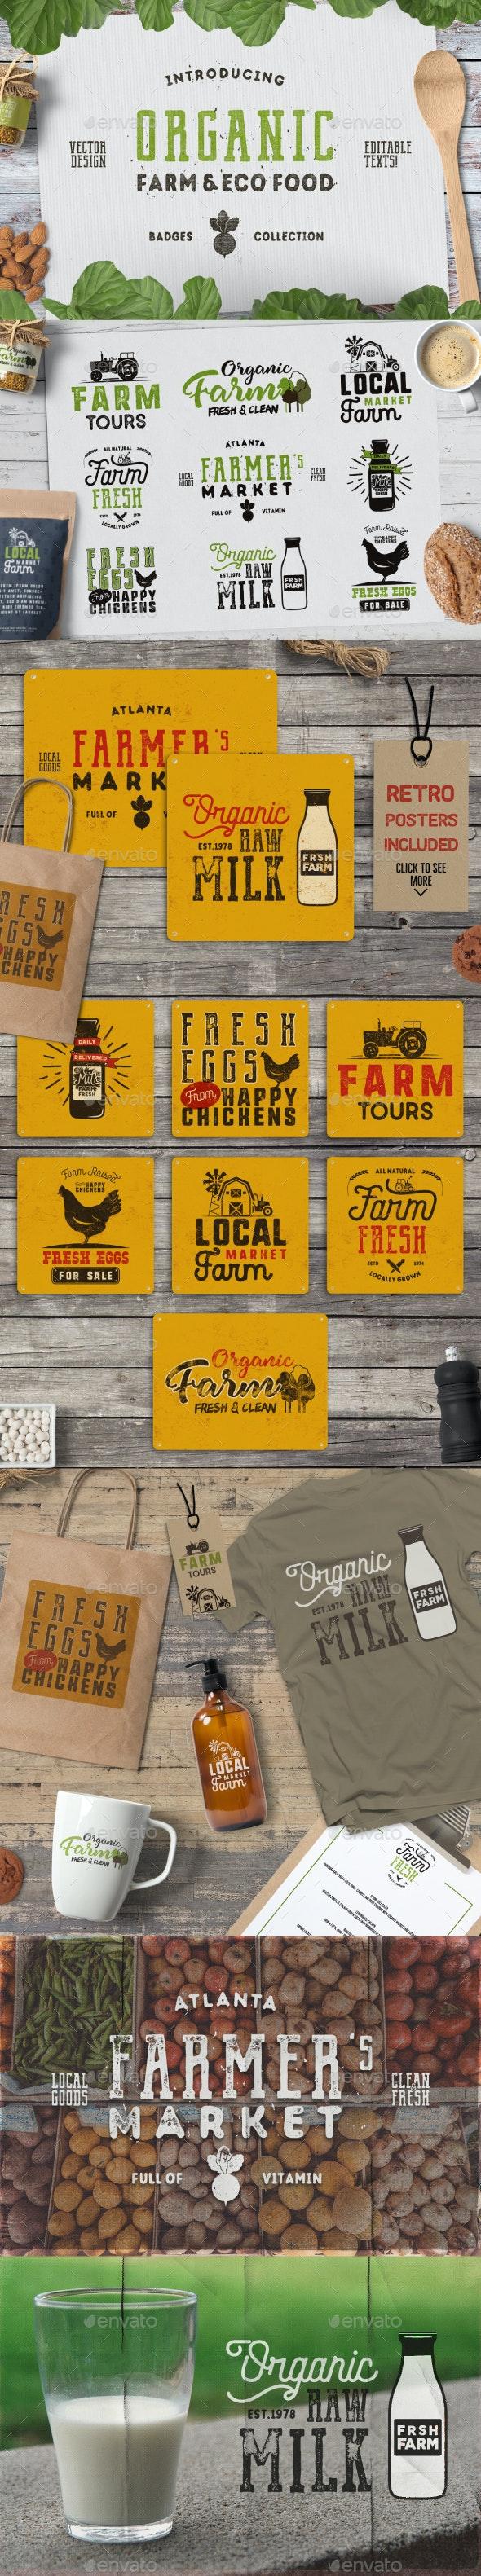 Organic Farm & Eco Food Badges - Badges & Stickers Web Elements